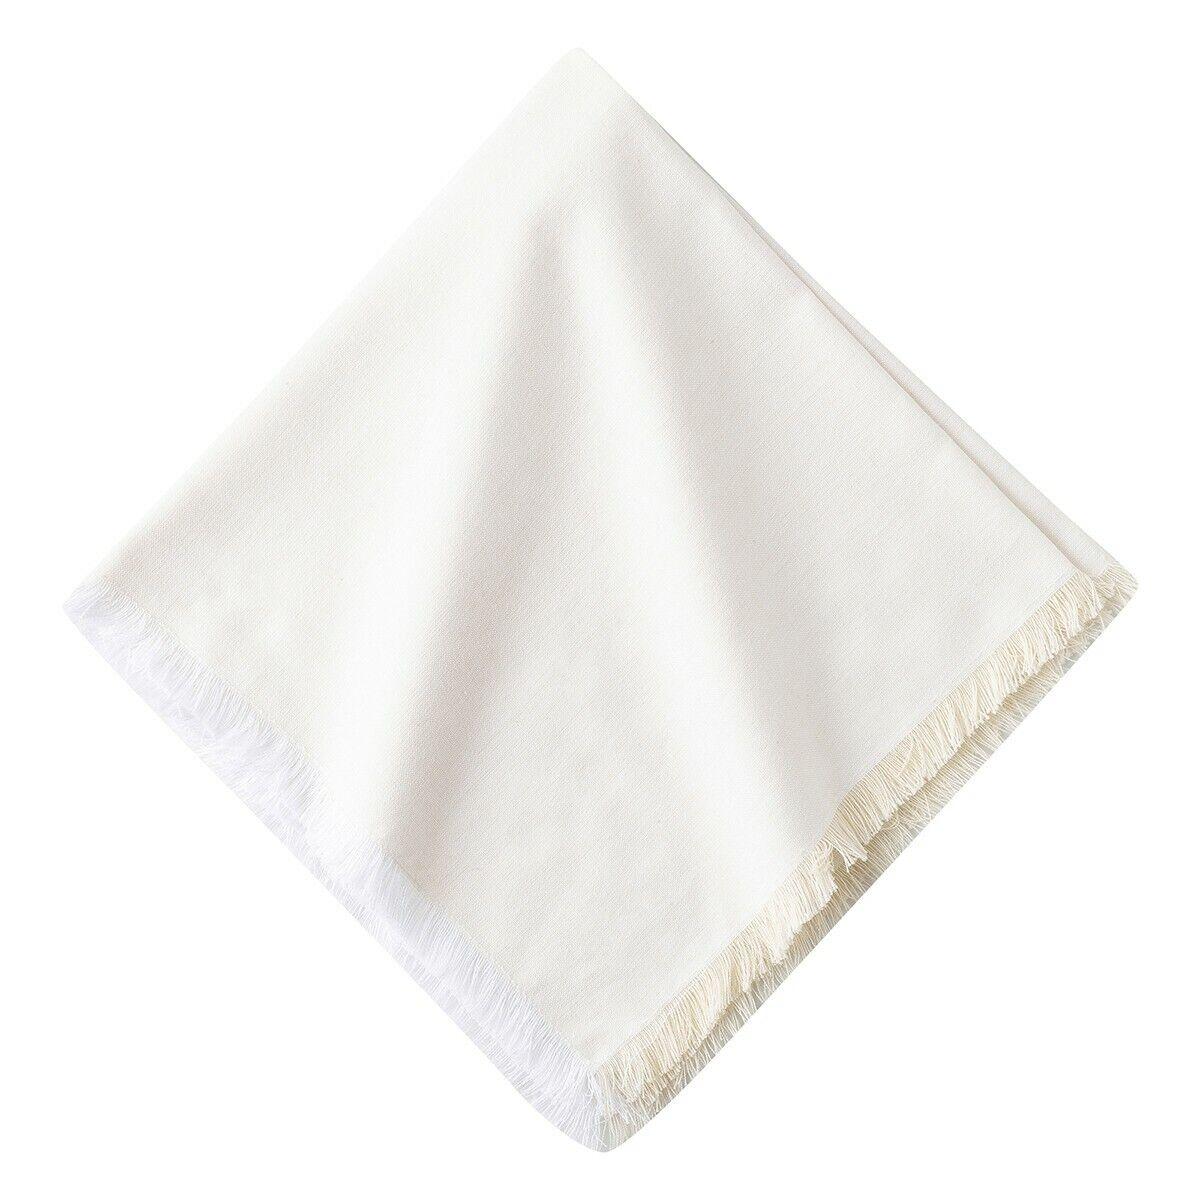 Juliska Essex blancwash serviette-Lot de 4